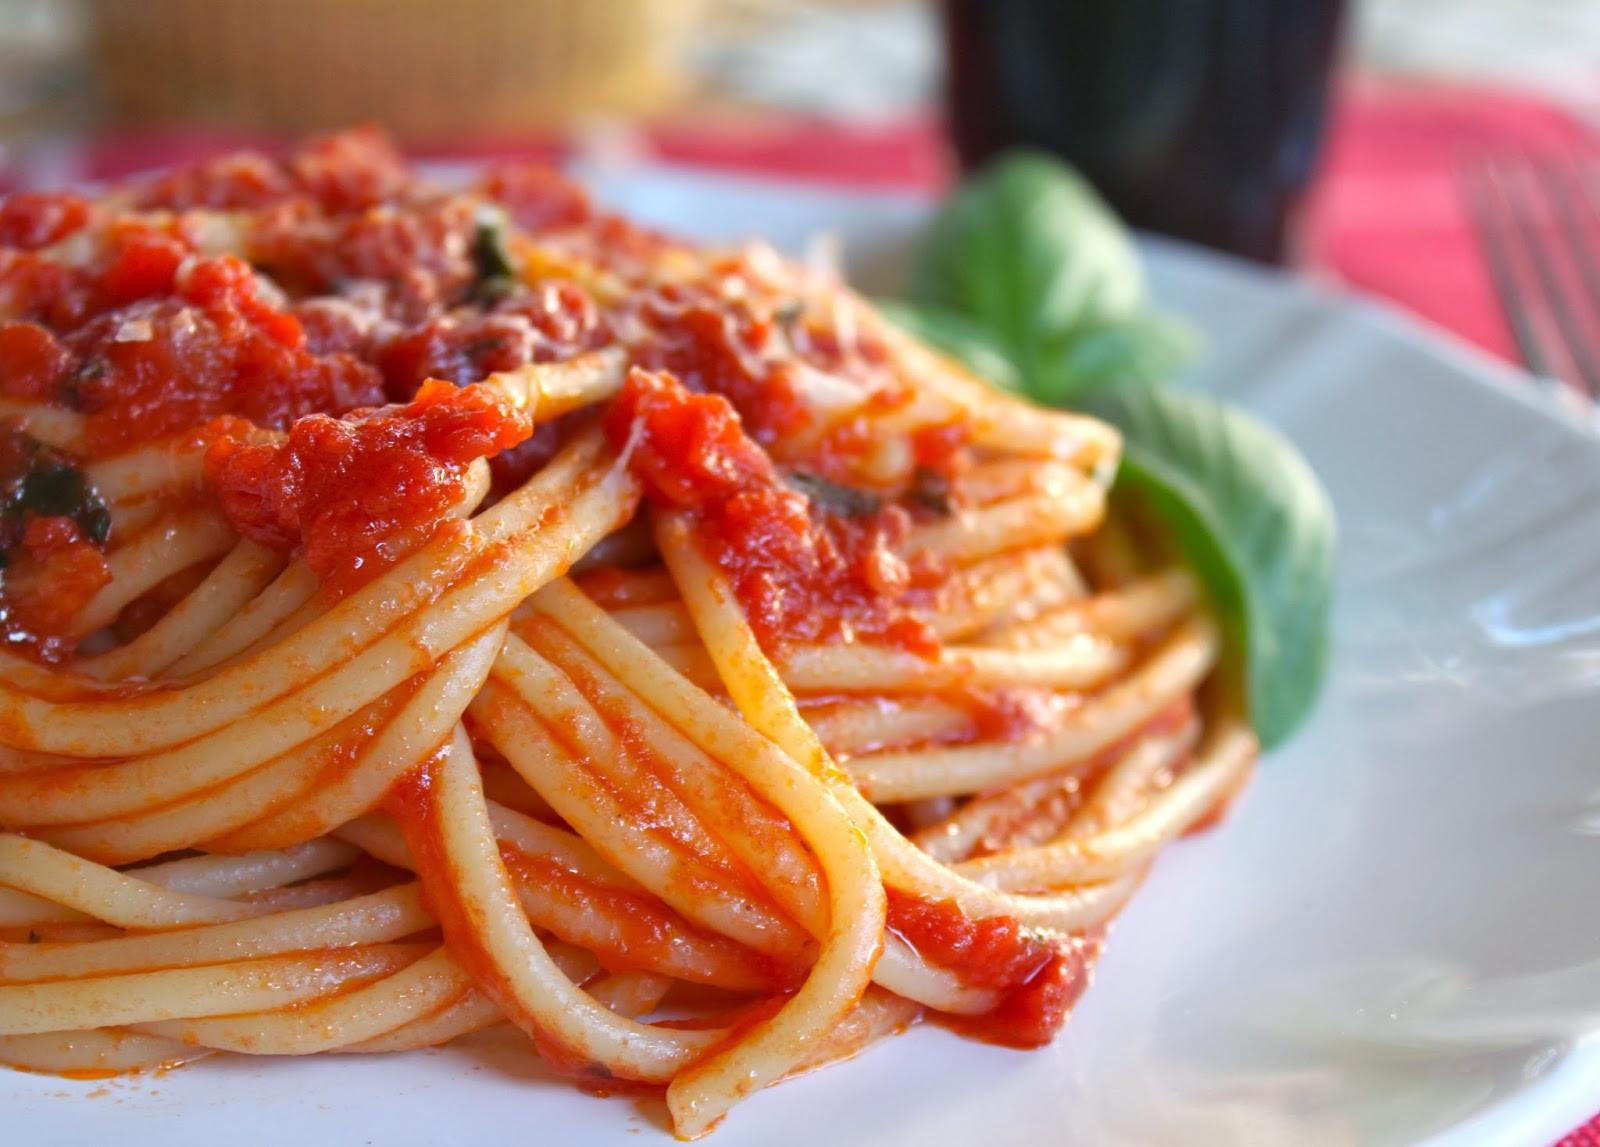 Italian Spaghetti Sauce  Authentic Quick Italian Tomato Sauce for Pasta